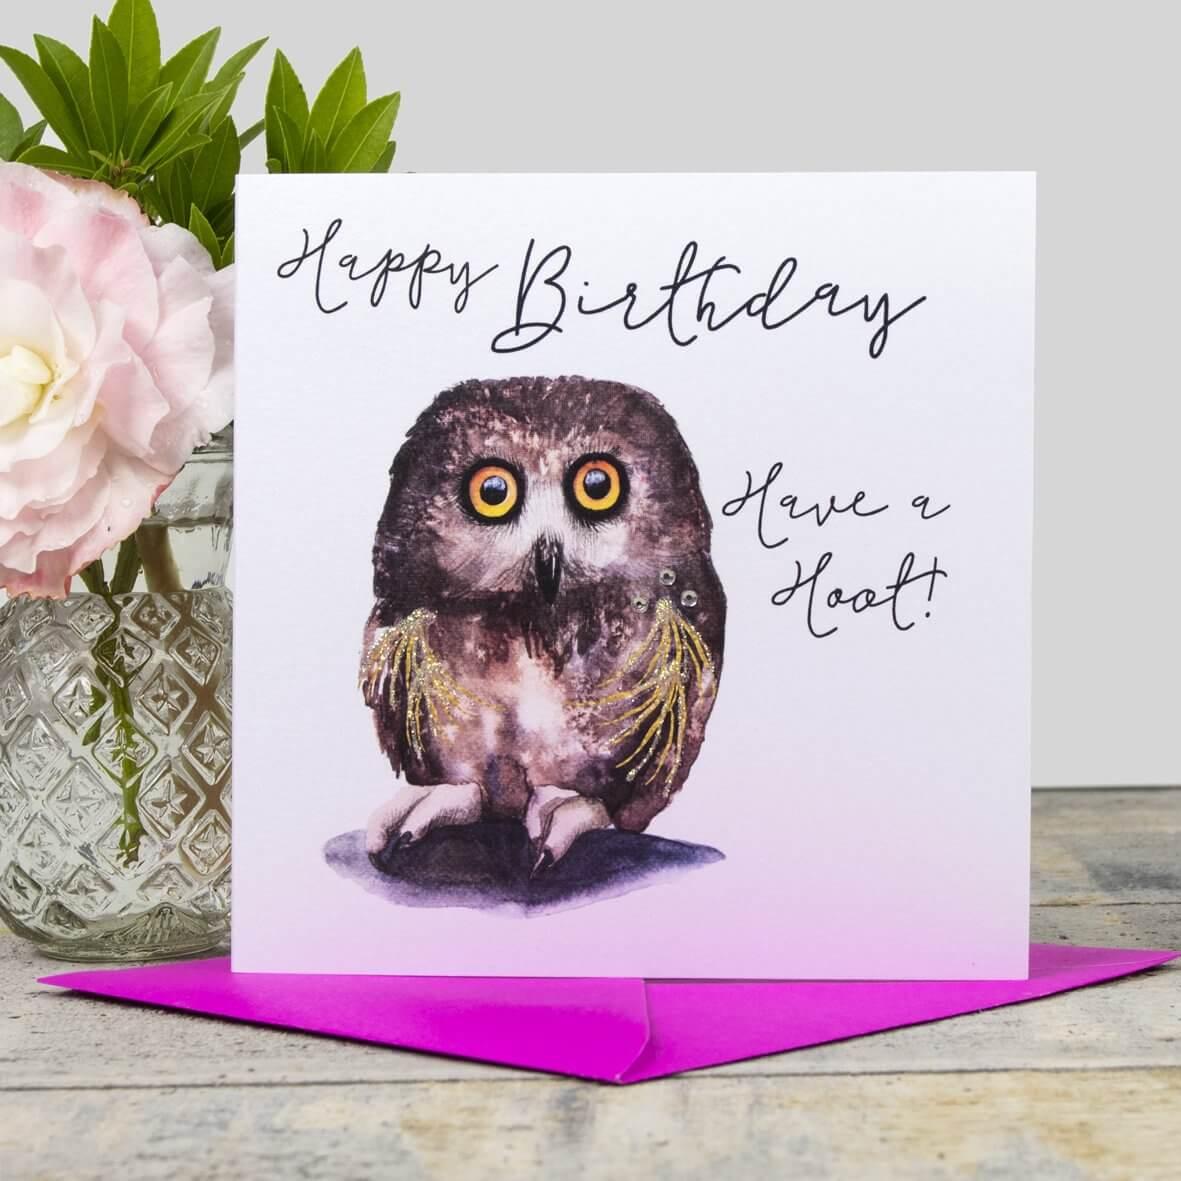 Happy Birthday - have a hoot card